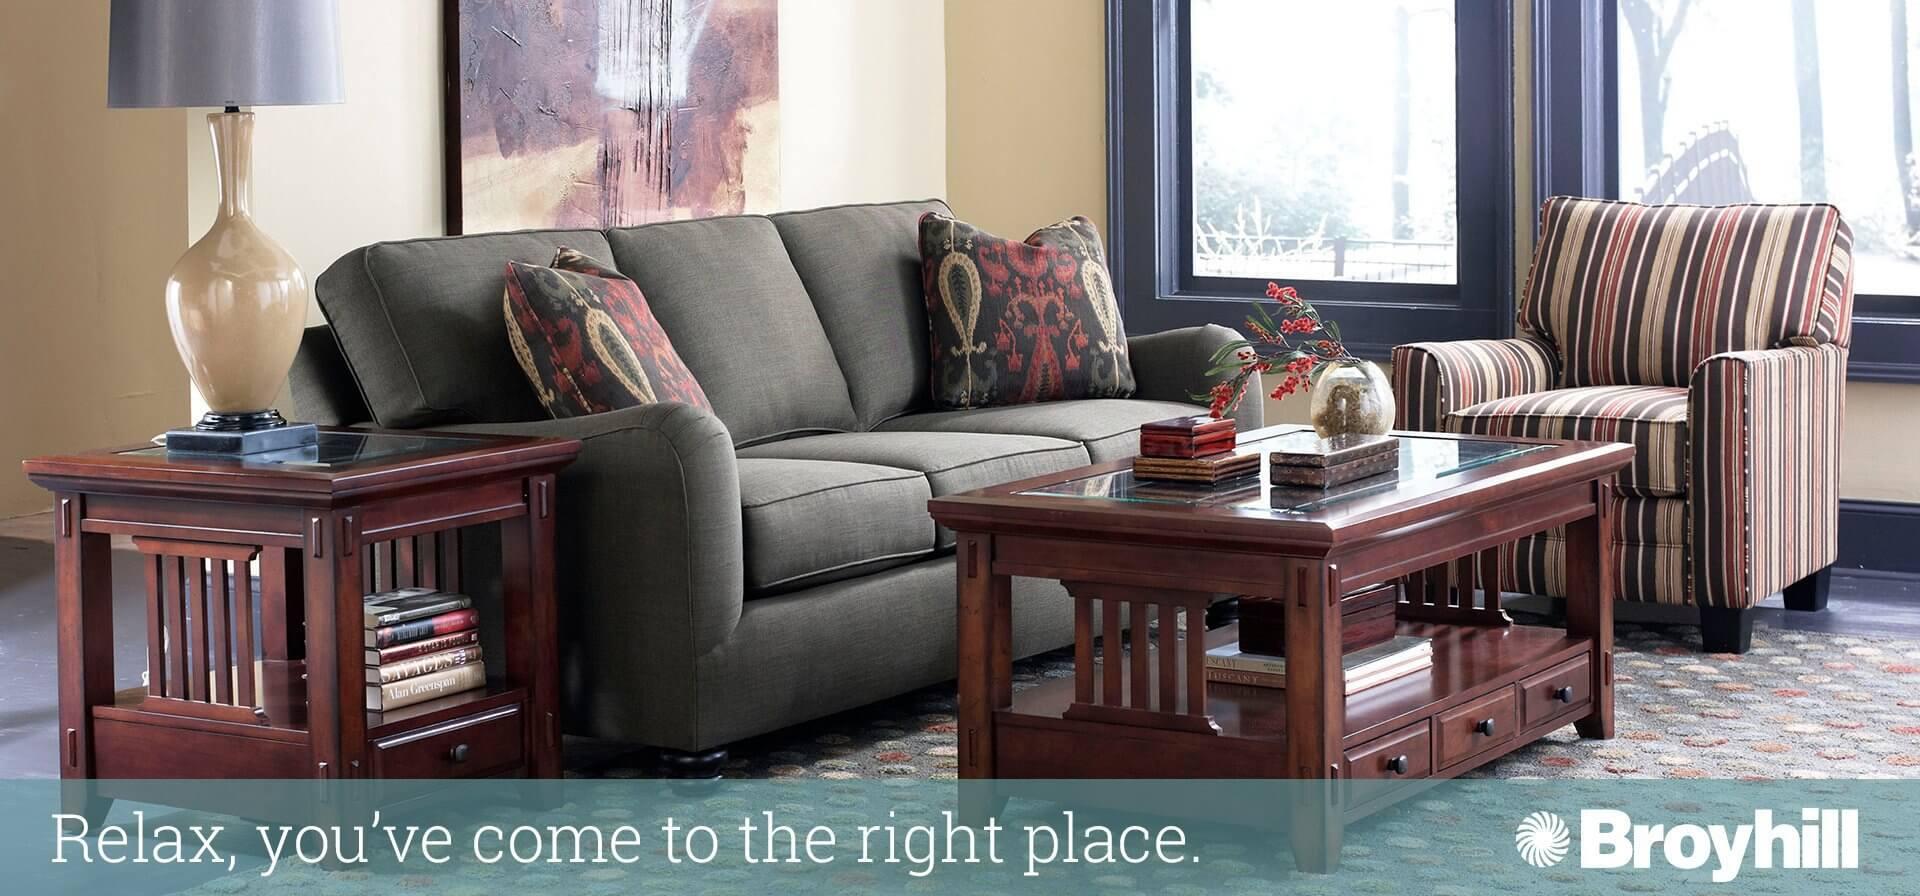 Great Furniture U0026 Mattresses In Plymouth, Sheboygan And Sheboygan Falls WI | Plymouth  Furniture